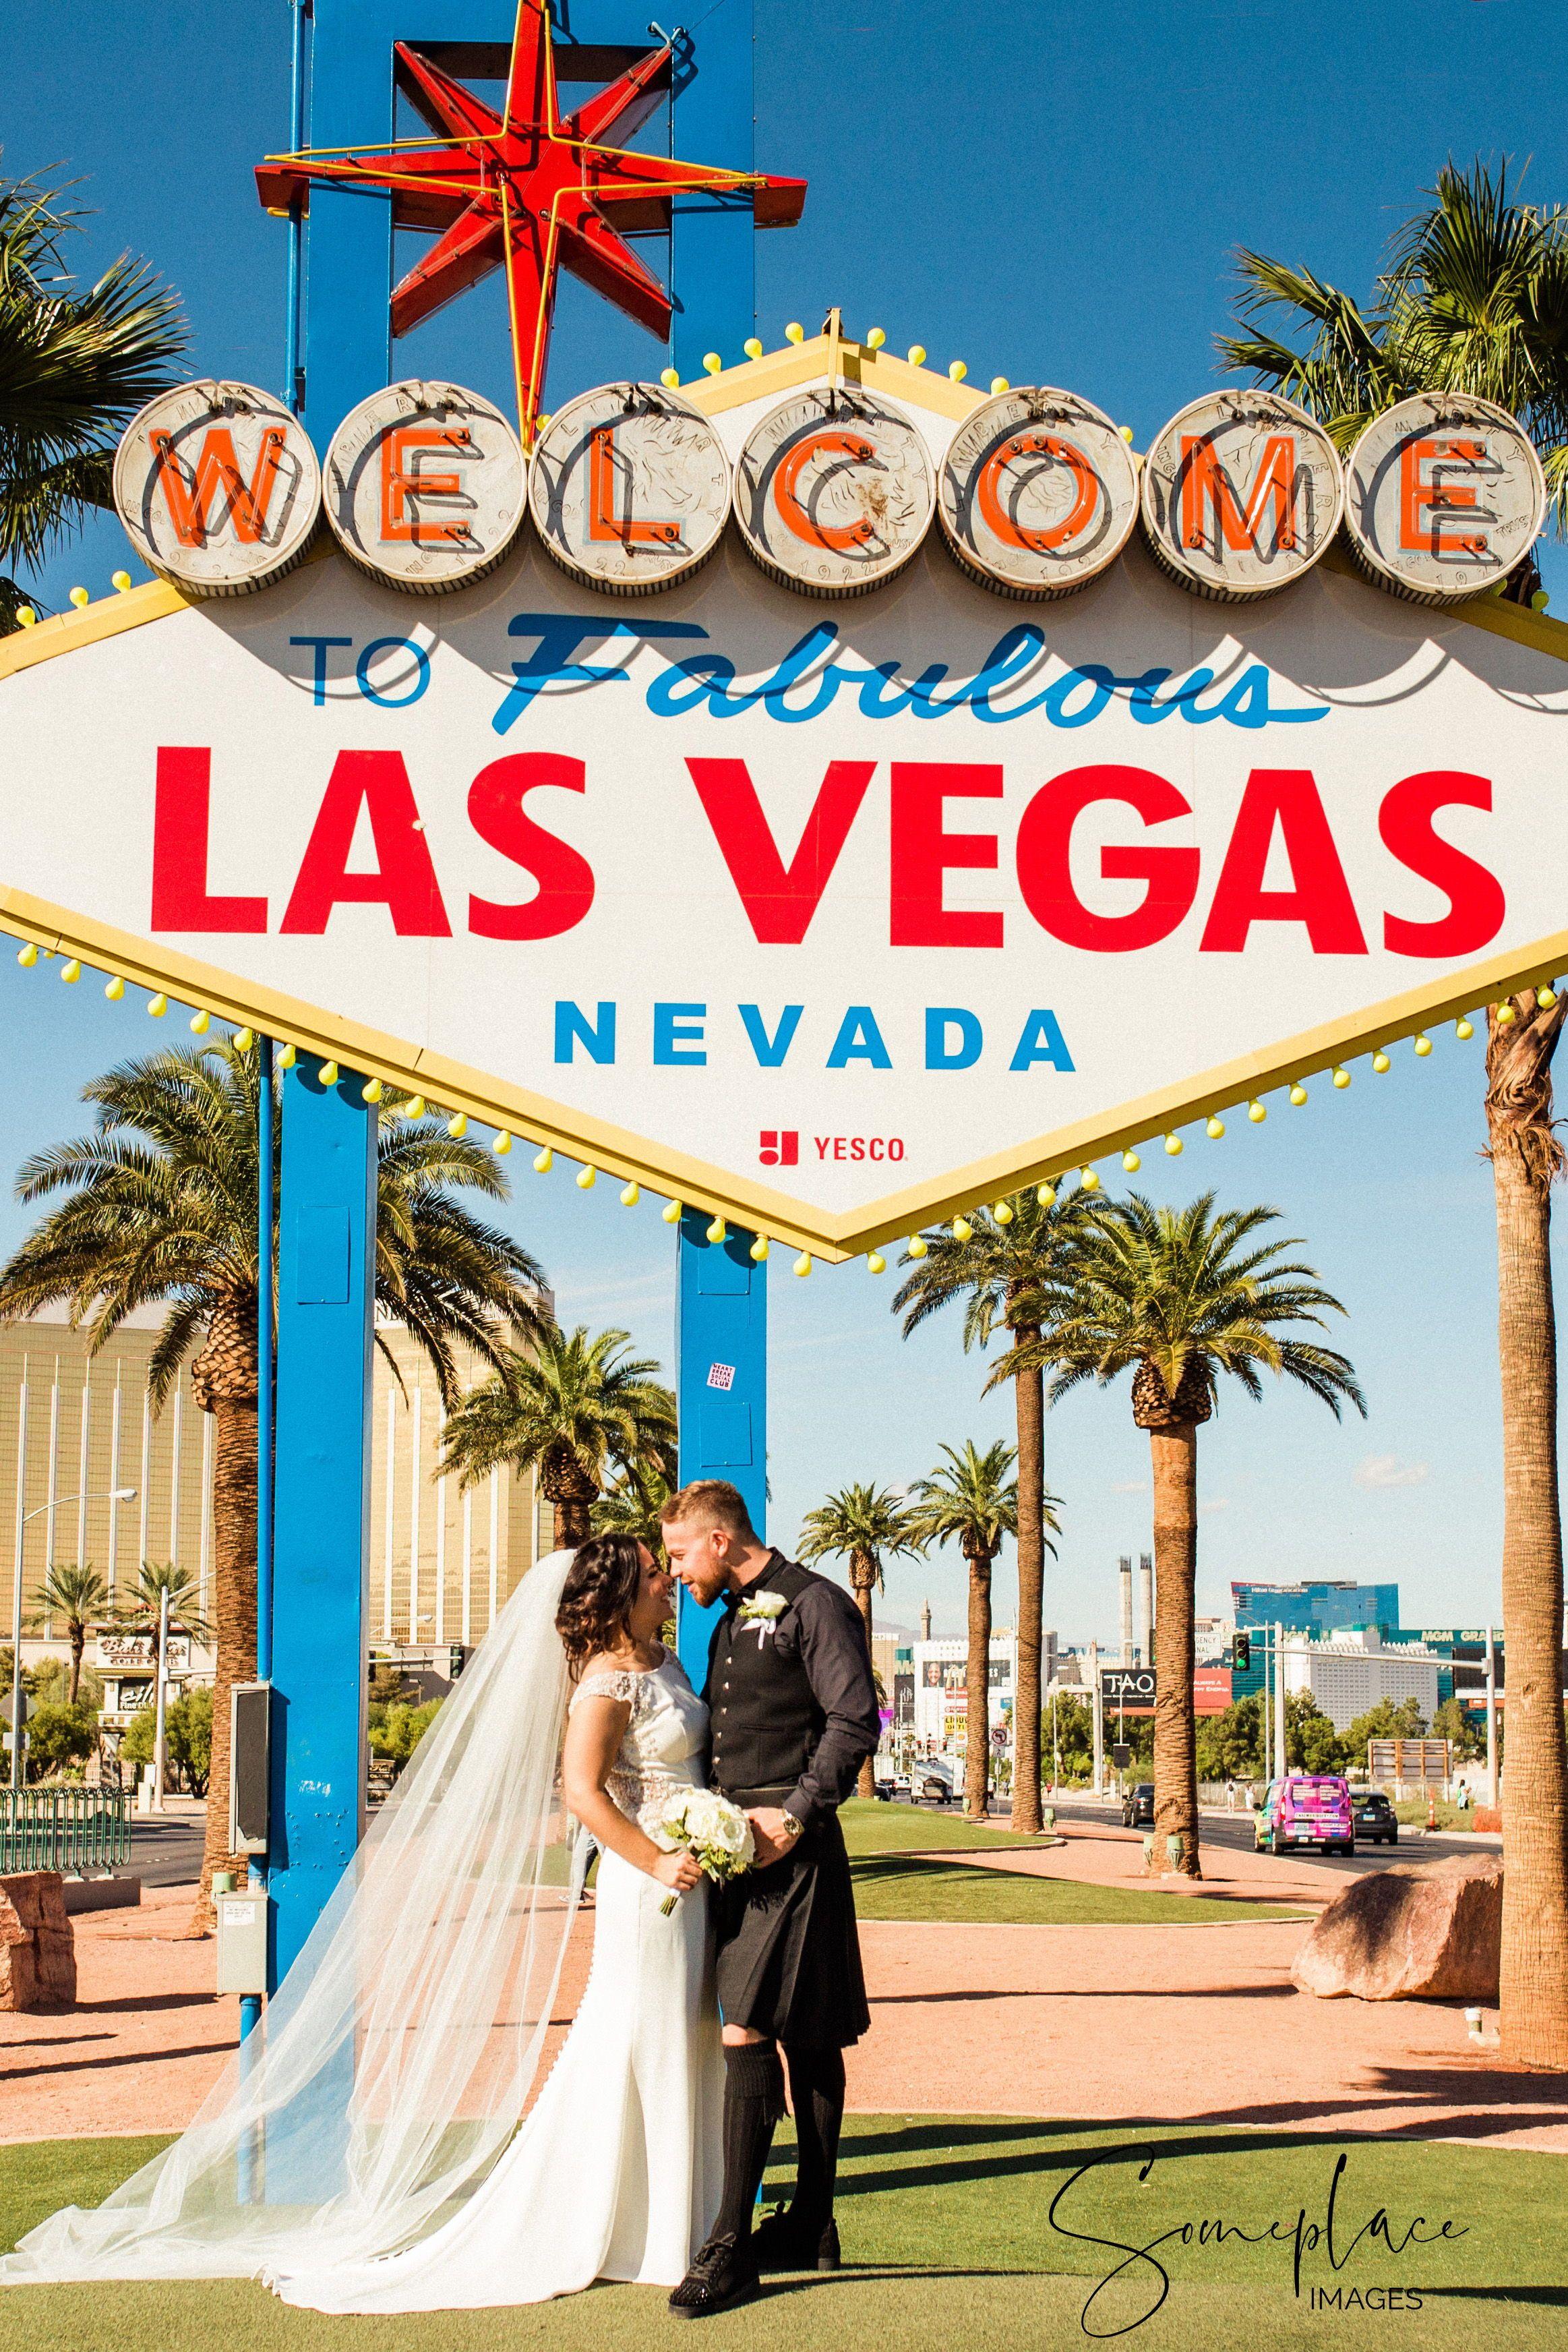 Las Vegas Destination Wedding With Bride And Groom At Las Vegas Sign Getting Marr Vegas Wedding Photos Las Vegas Wedding Planner Las Vegas Wedding Inspiration